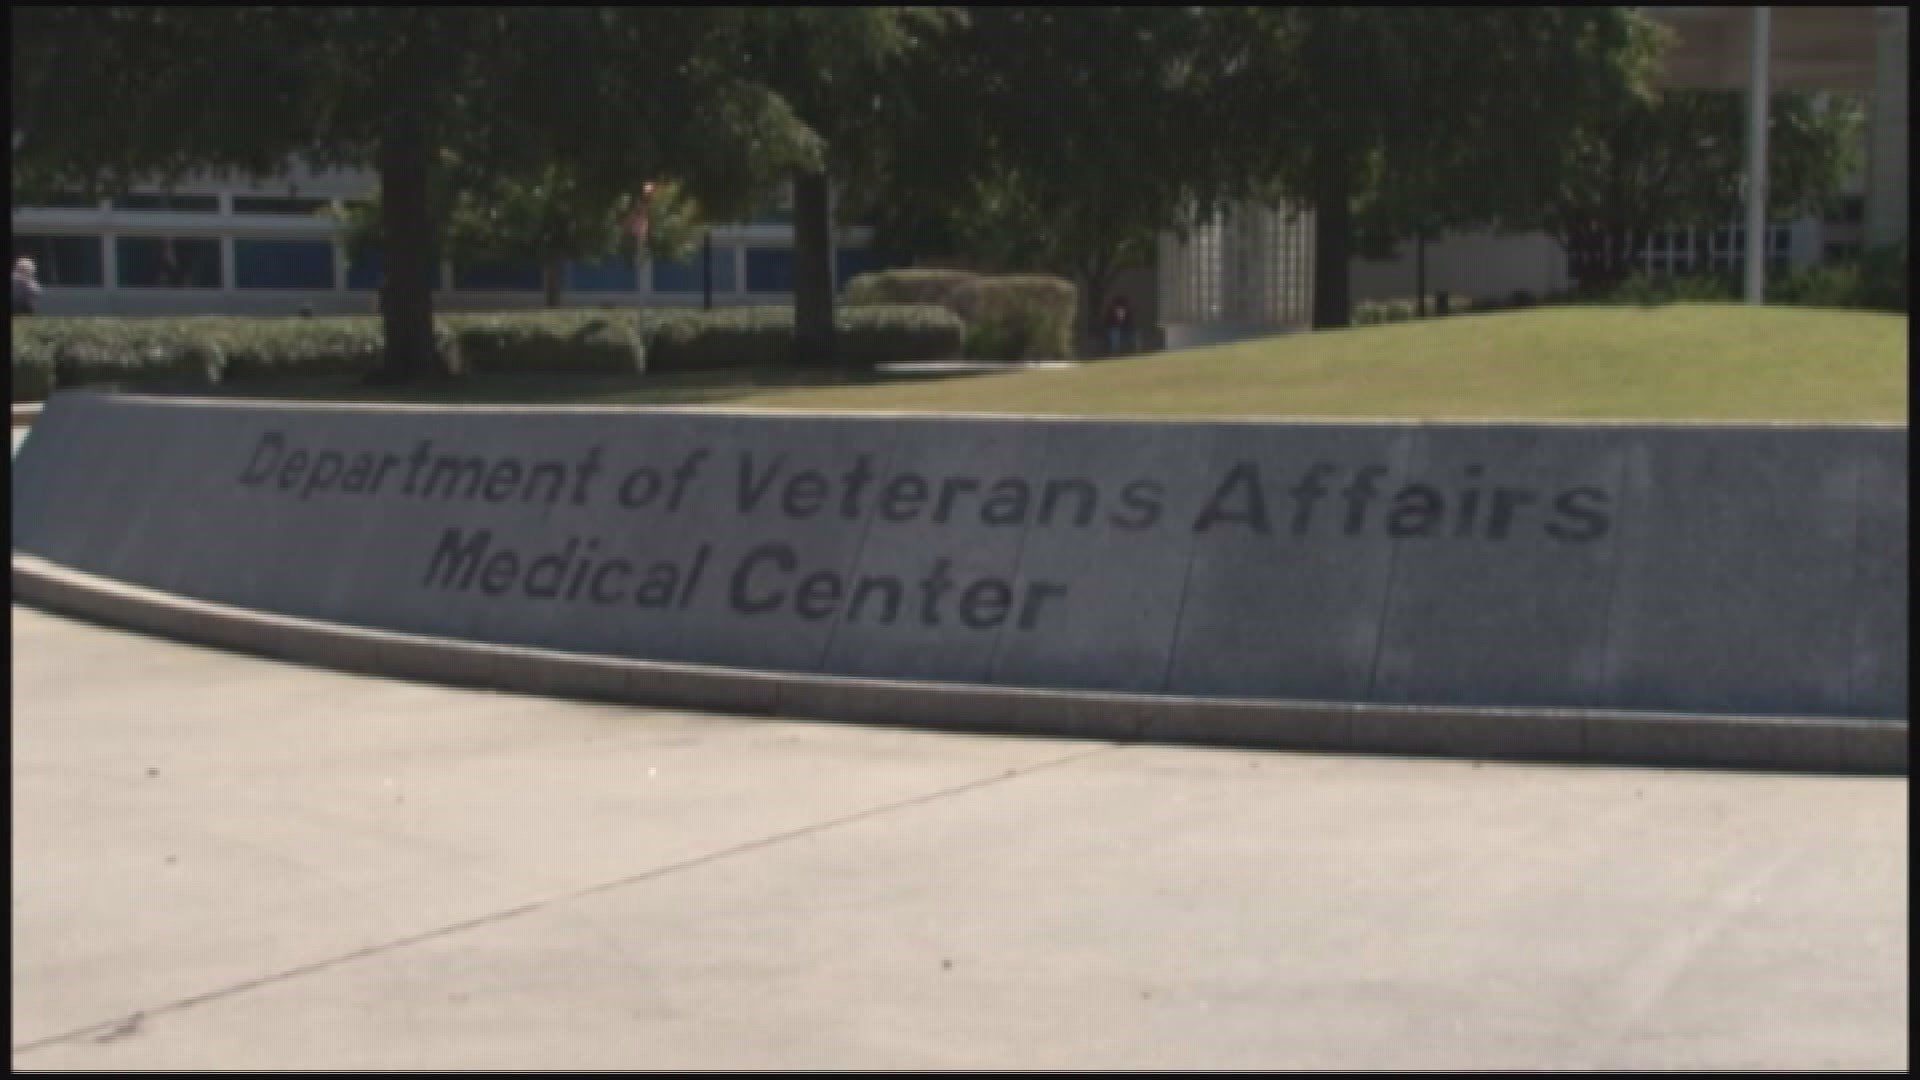 Charlie Norwood VA Medical Center prepares for Hurricane Irma